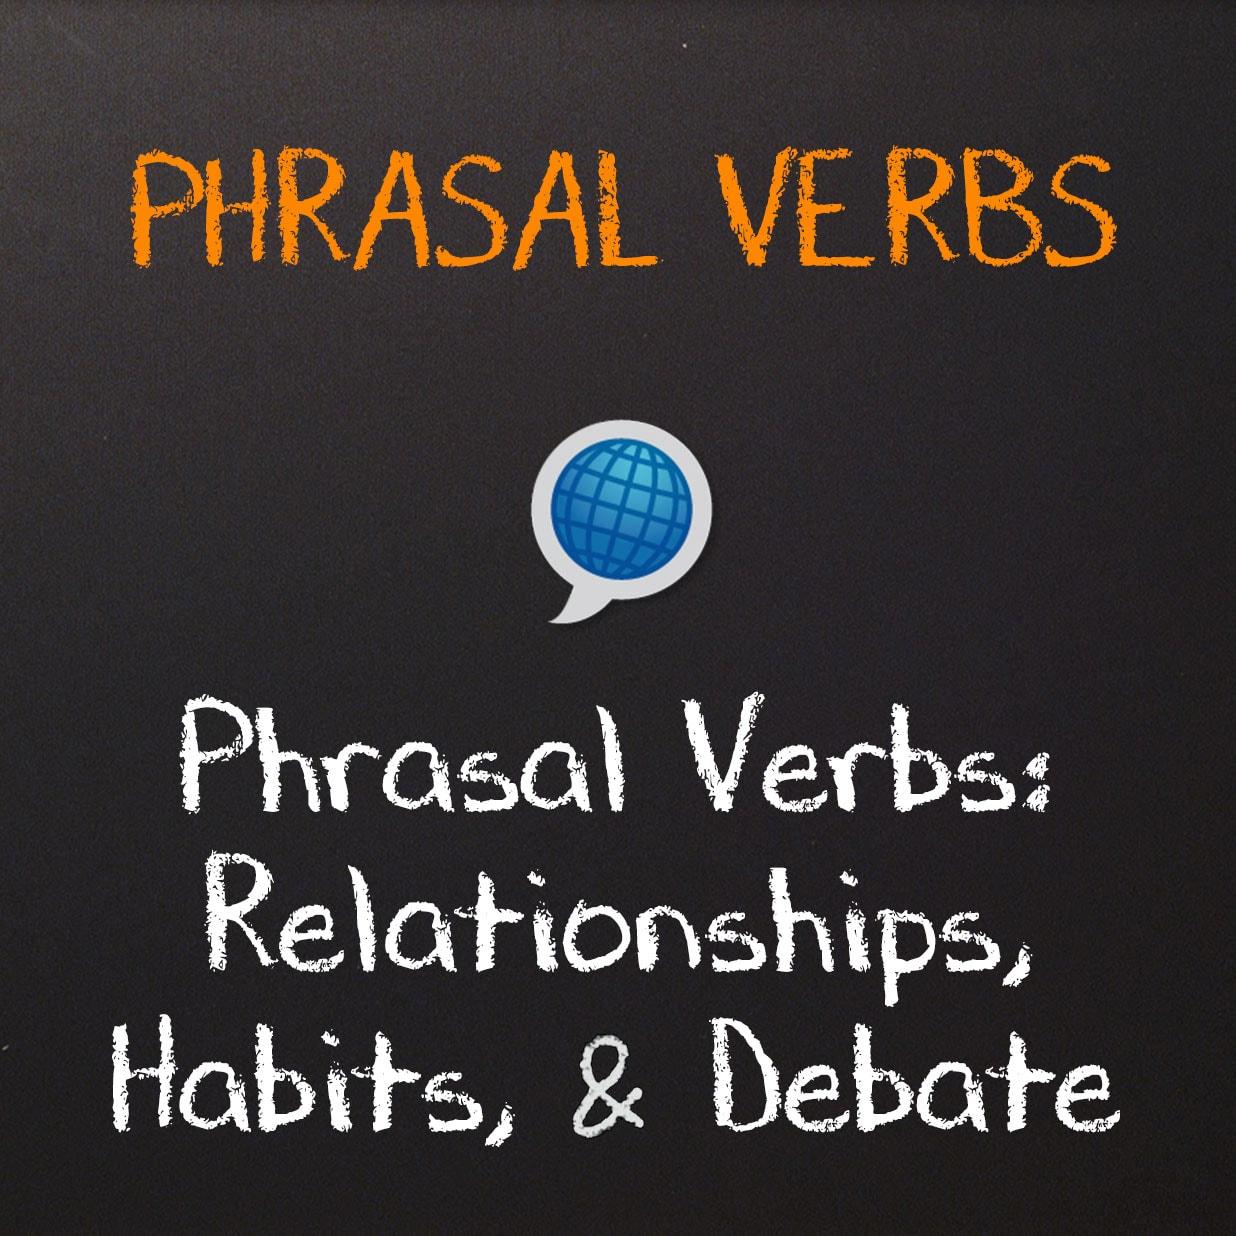 Phrasal Verbs: Relationships, Habits, & Debate